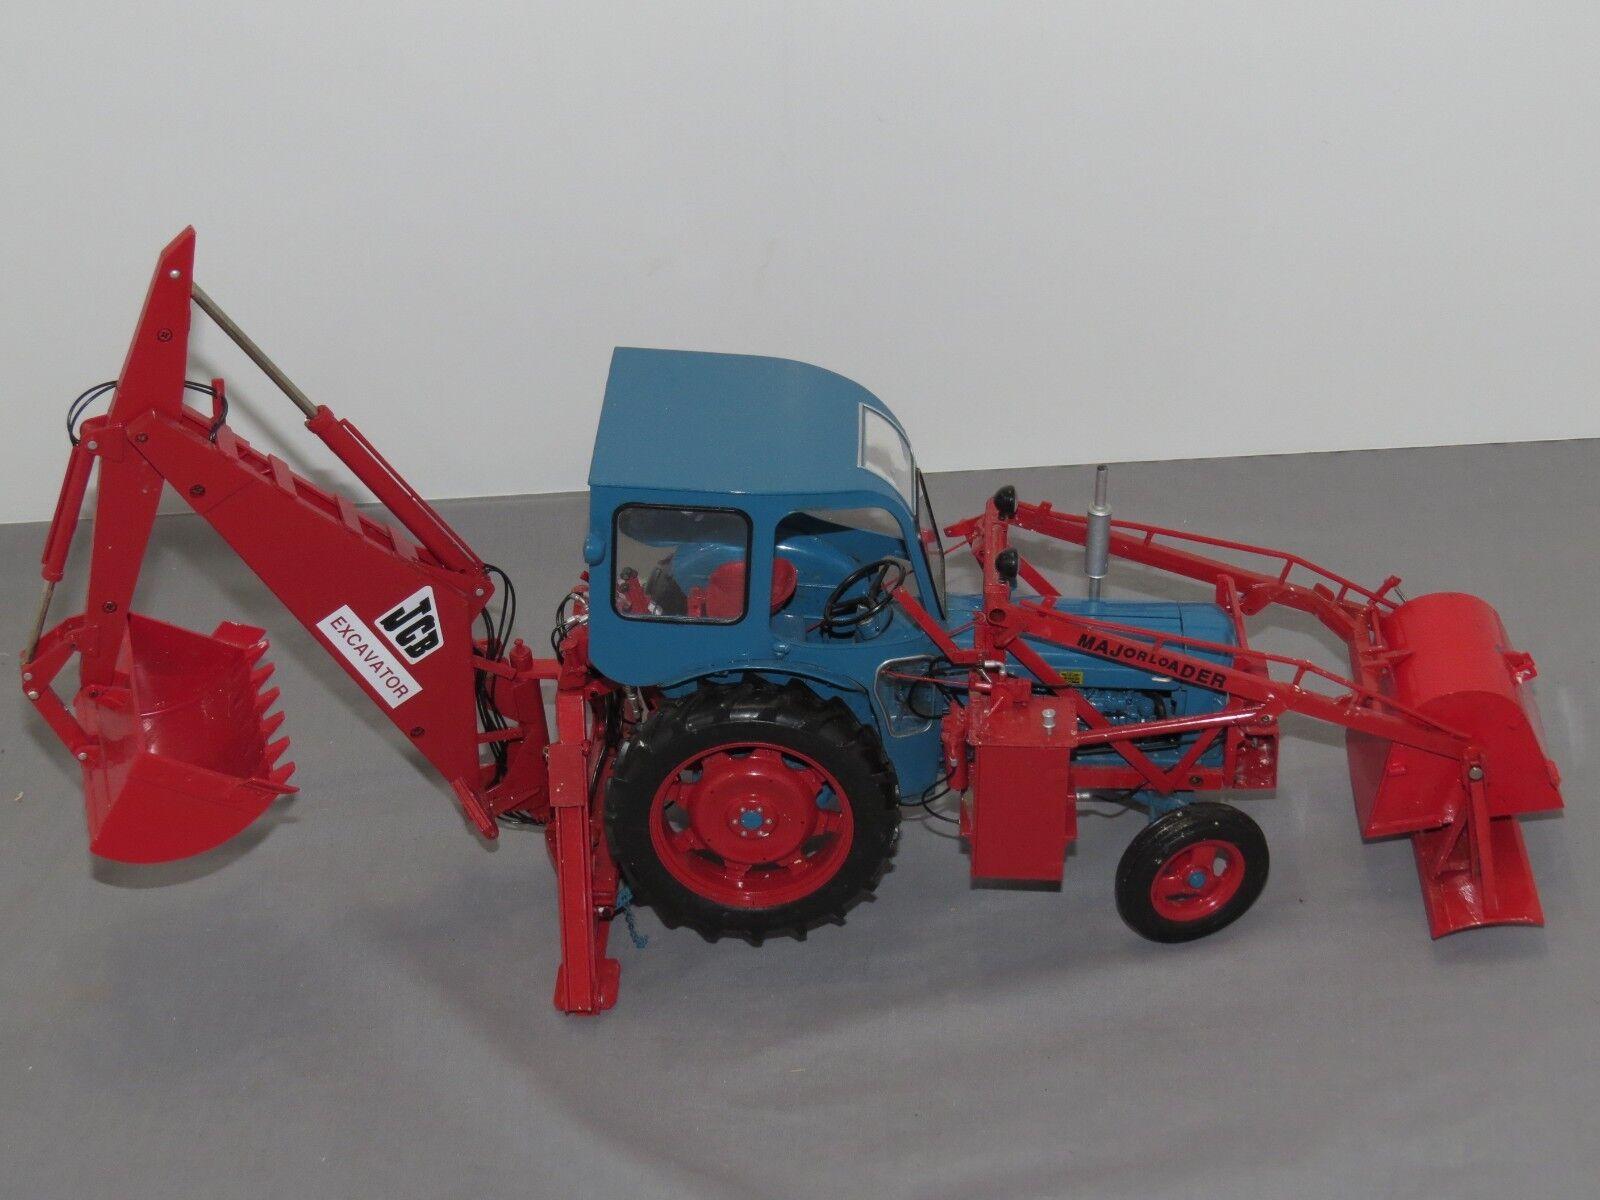 Excavadora JCB principales Cargador Mk 1 Universal Hobbies 1:16 Diecast Retroexcavadora Sharp